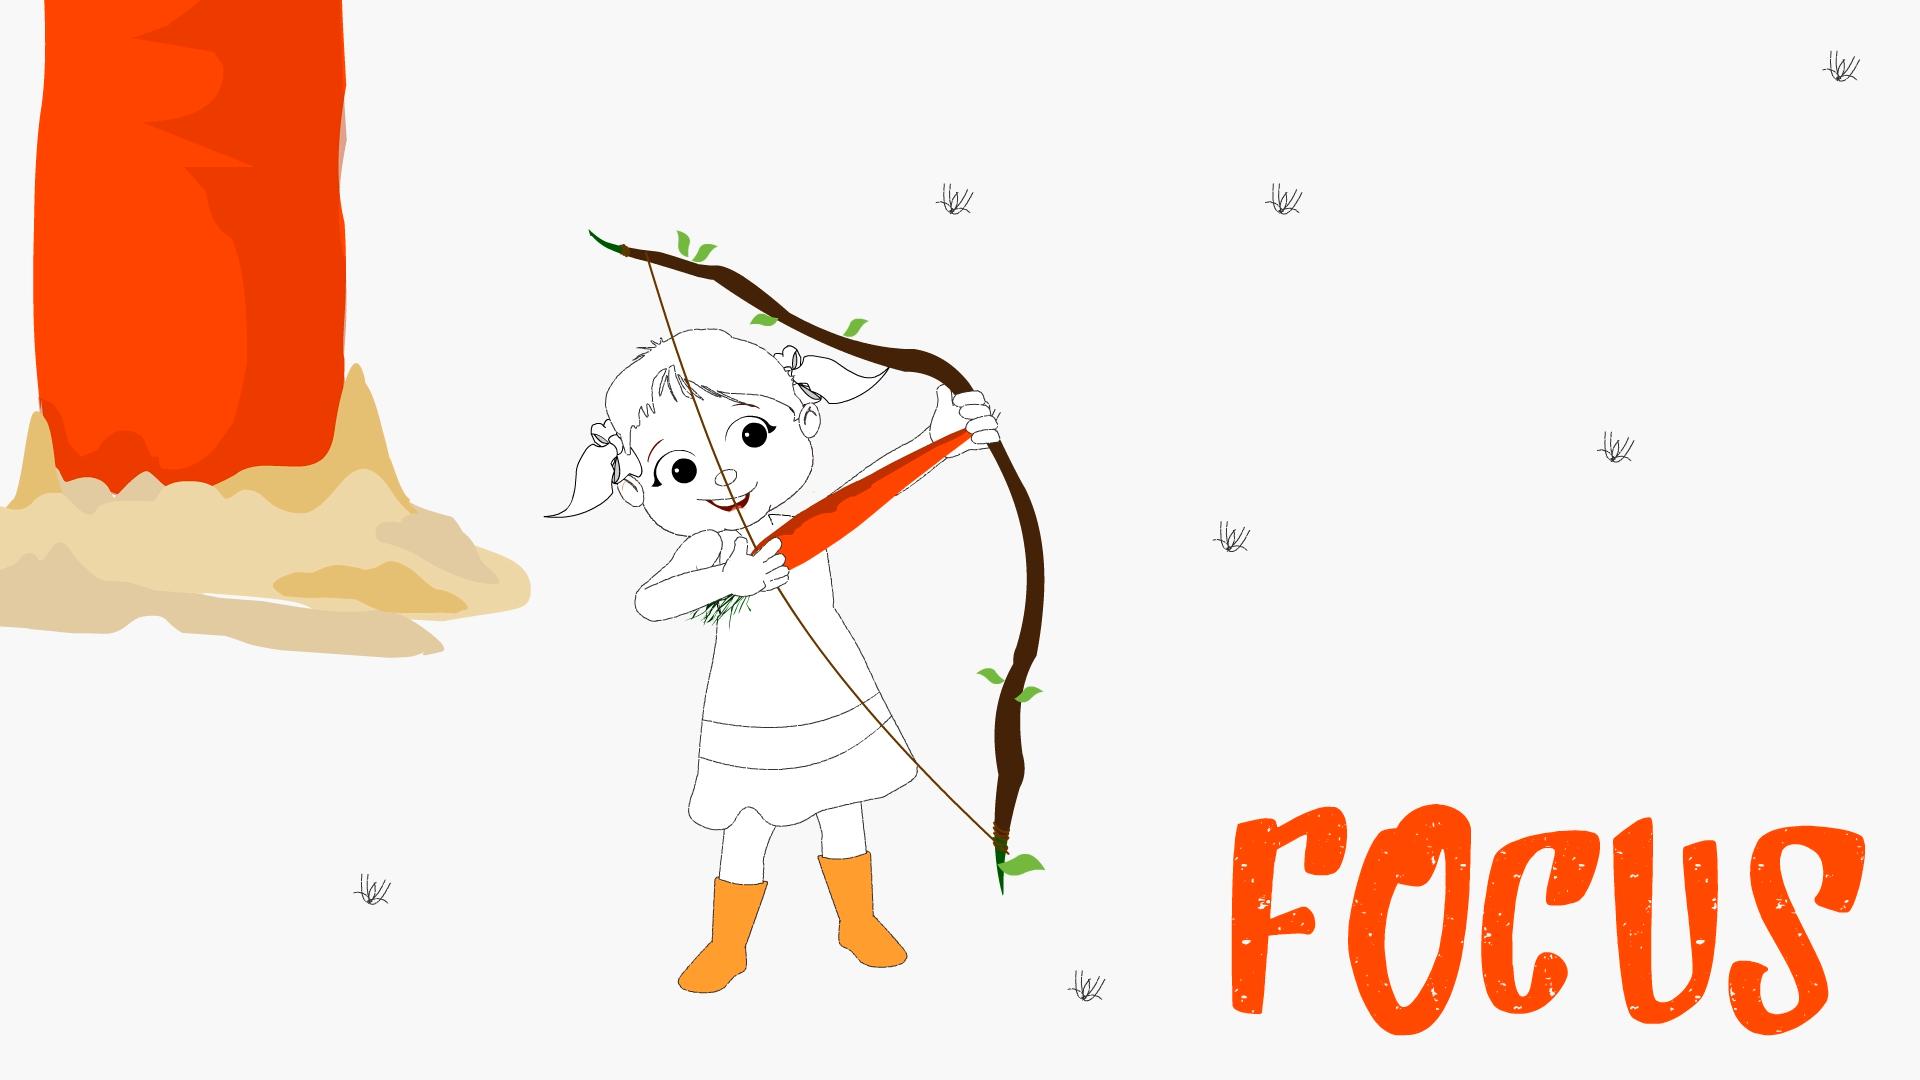 media agency in dubai carrot and stick